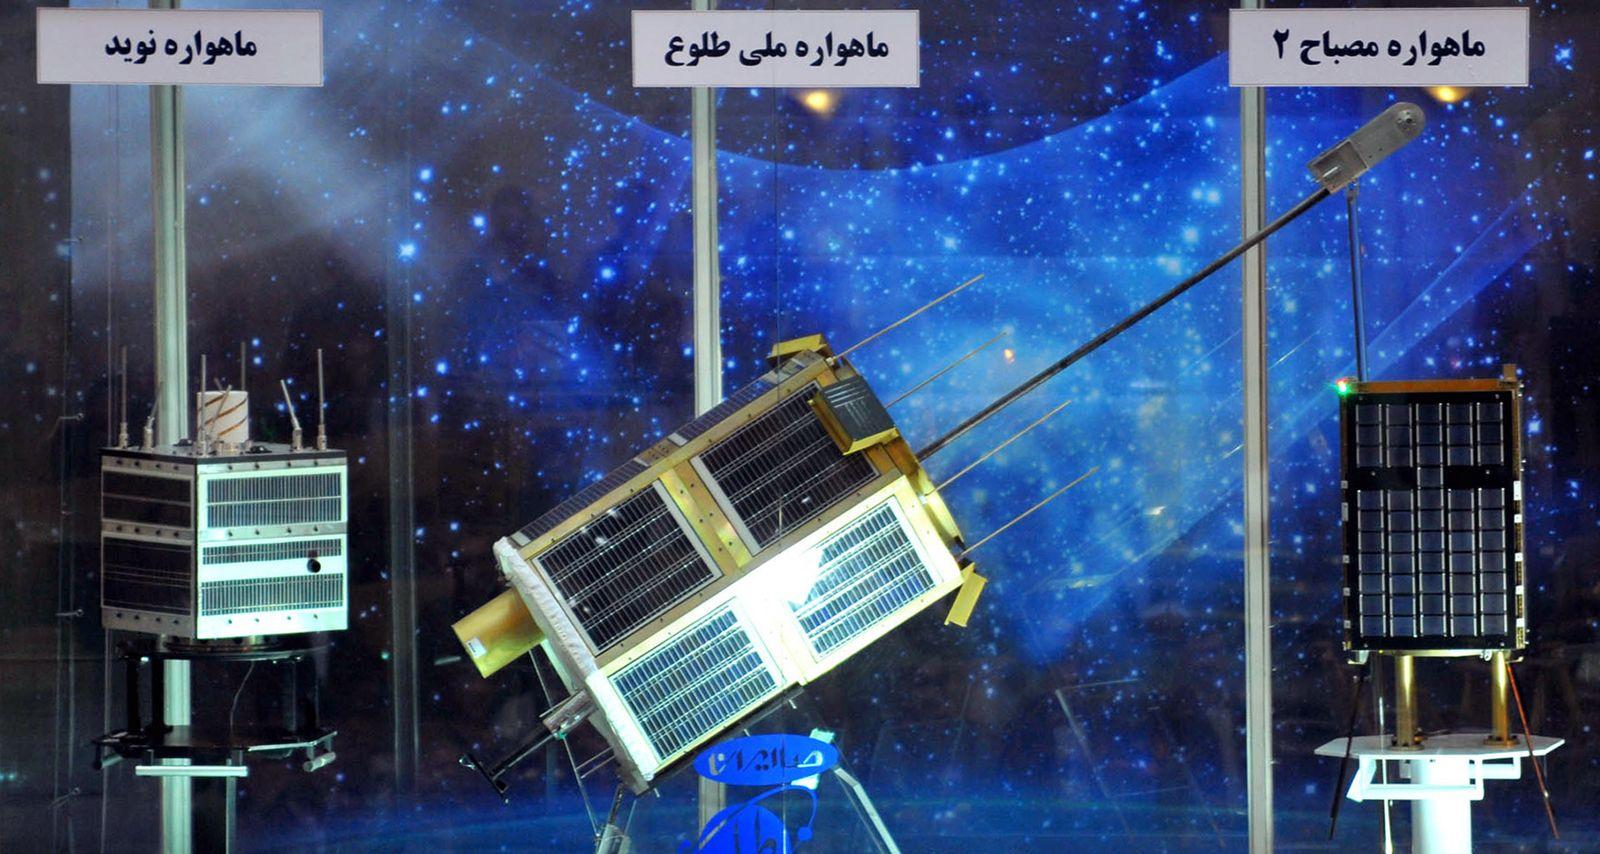 Iran / Navid / Satellit